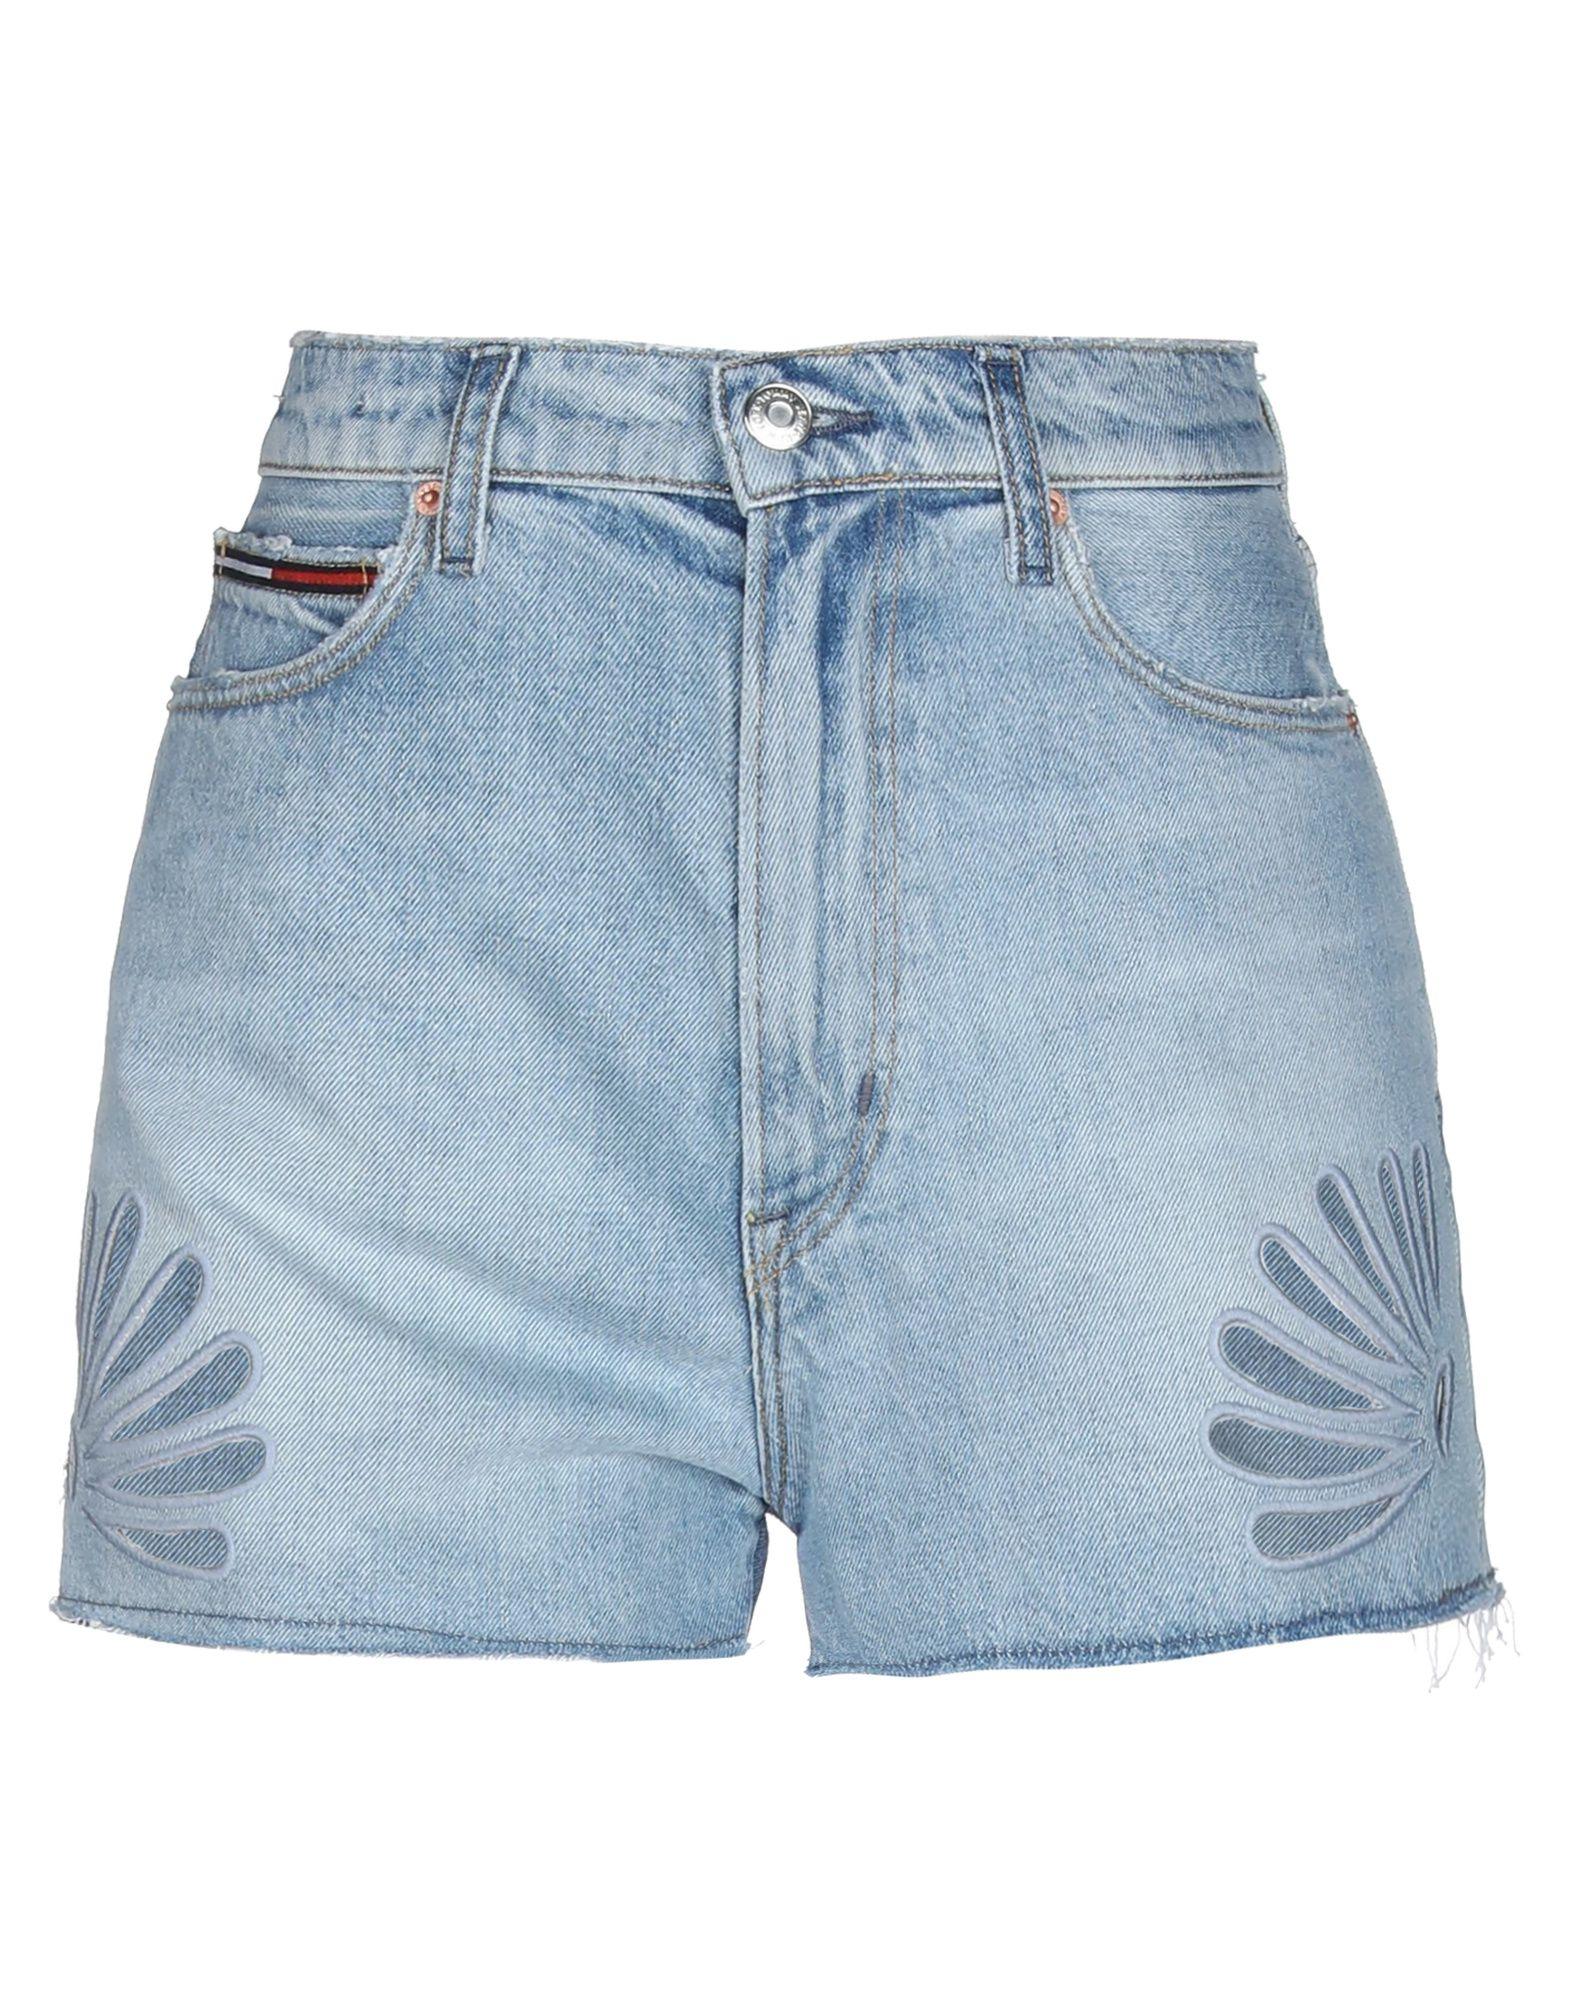 TOMMY JEANS Джинсовые шорты шорты джинсовые tommy jeans tommy jeans to052emebru4